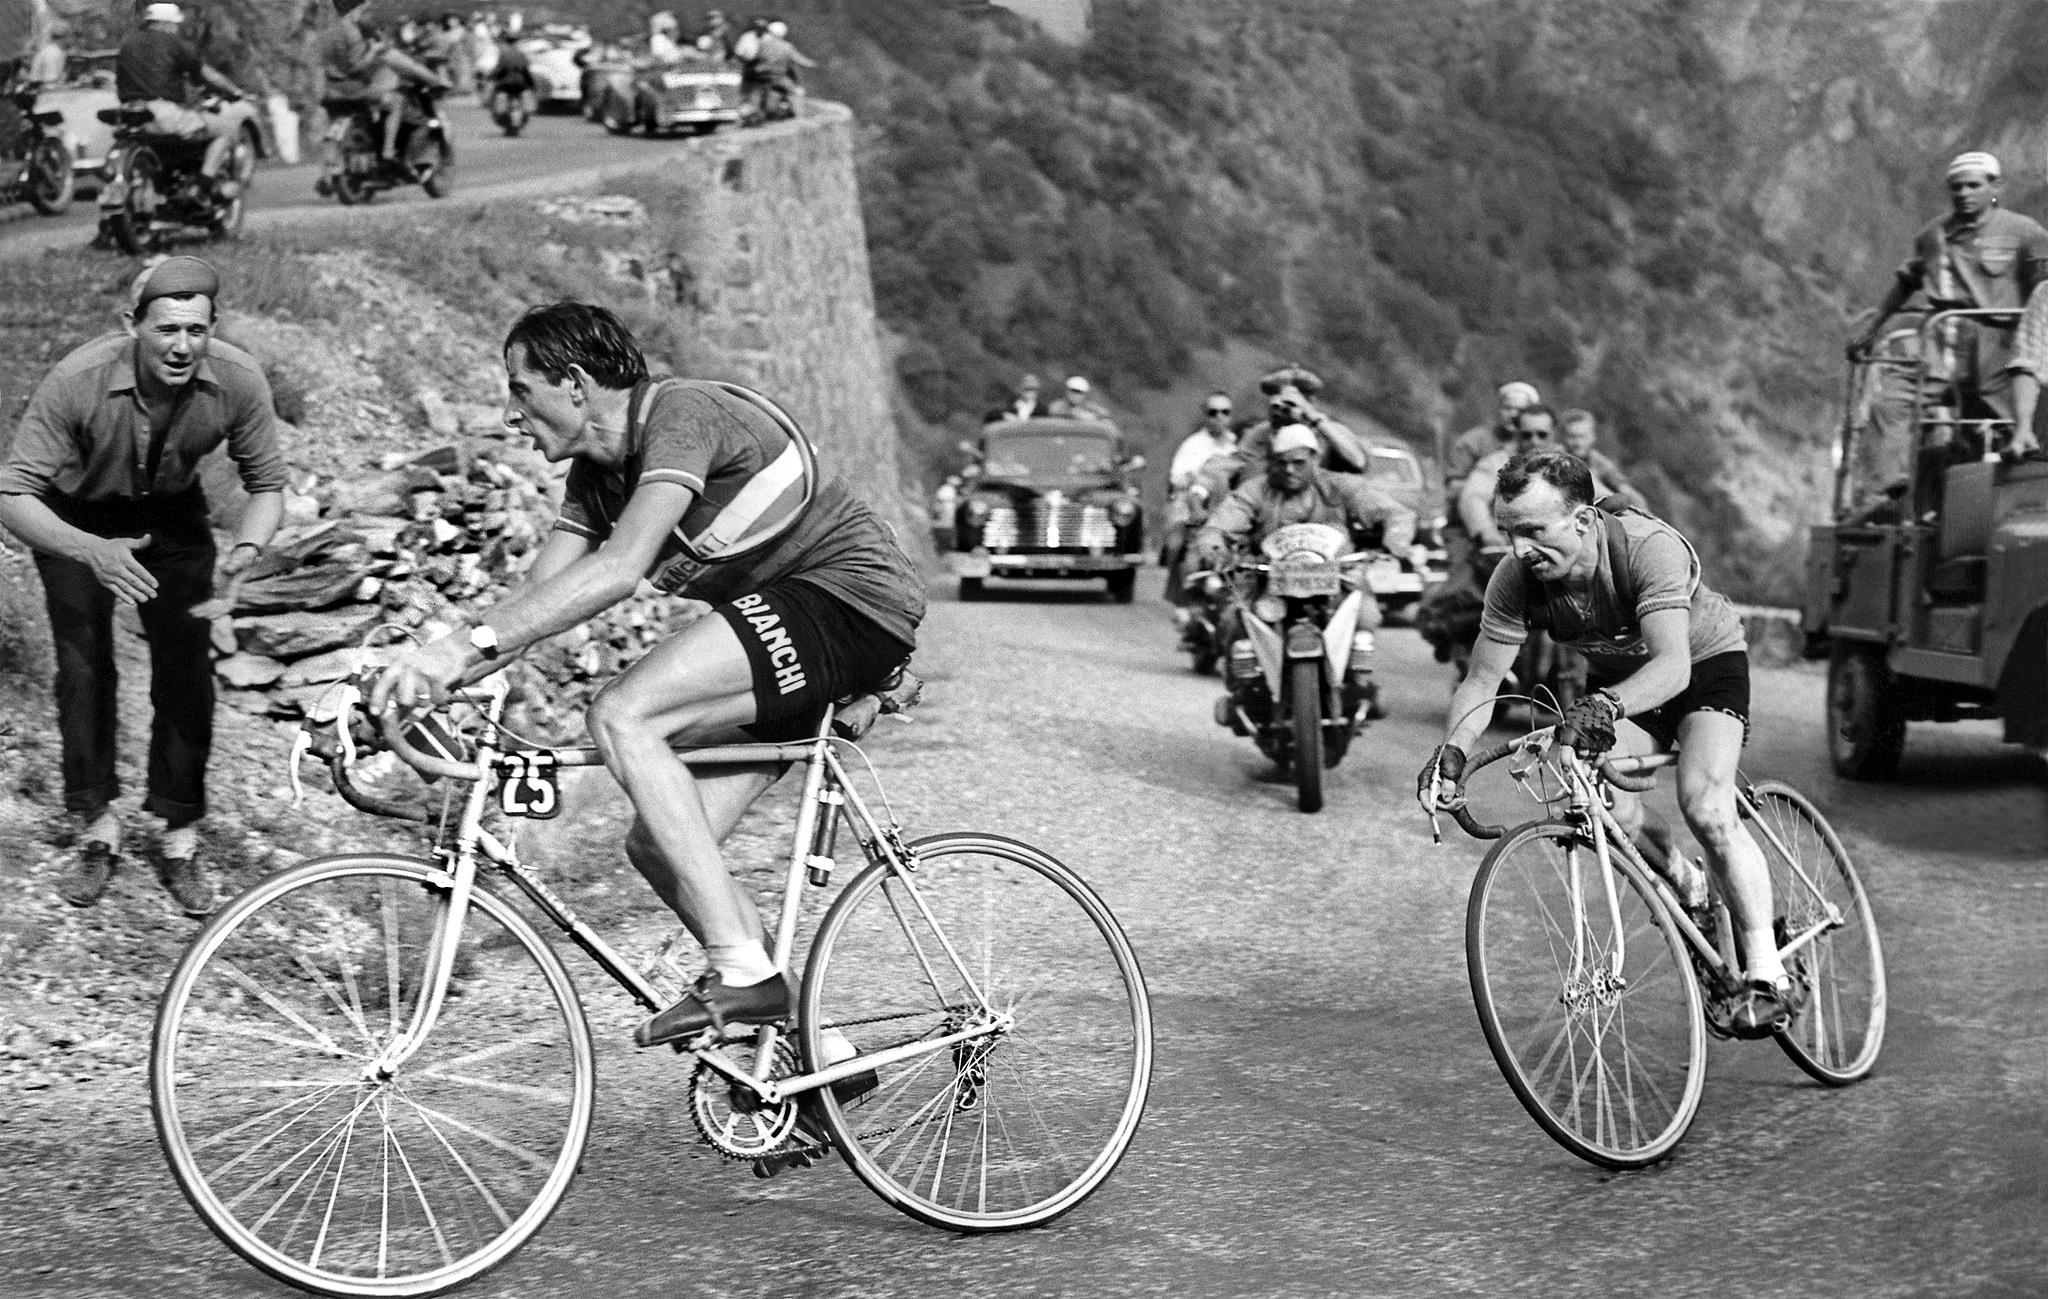 Fausto Coppi and Jean Robic